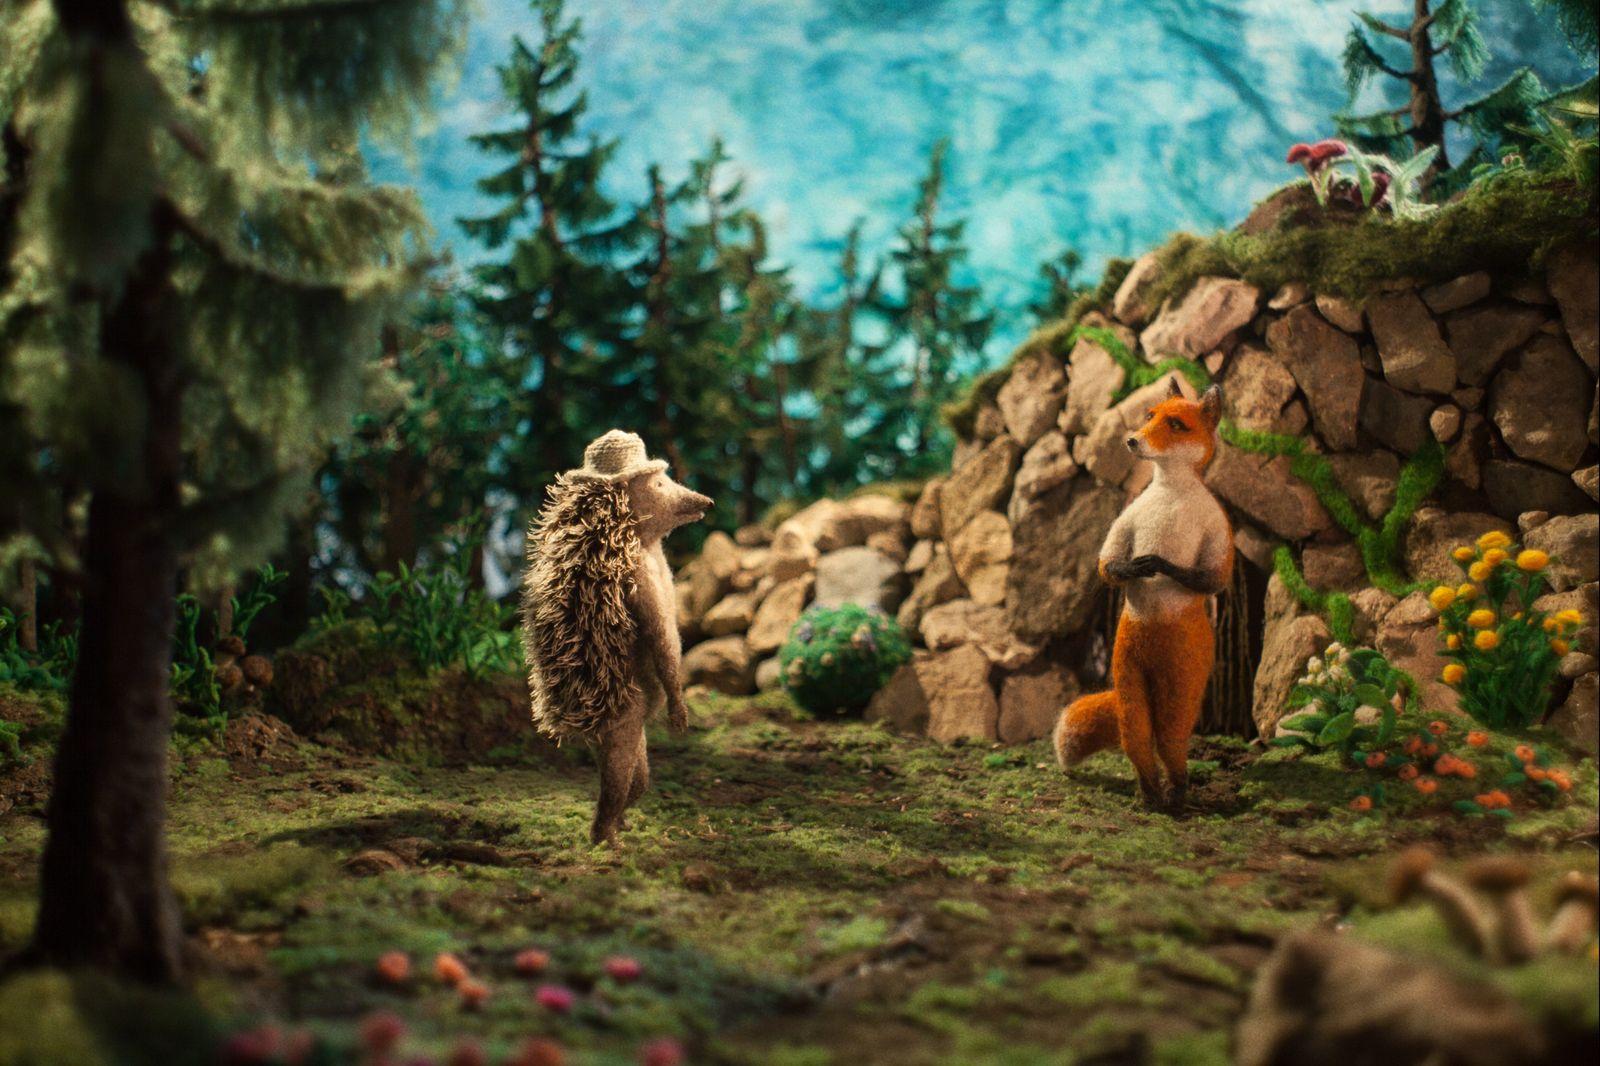 Hedgehog's Home to Premiere at Berlin International Film Festival